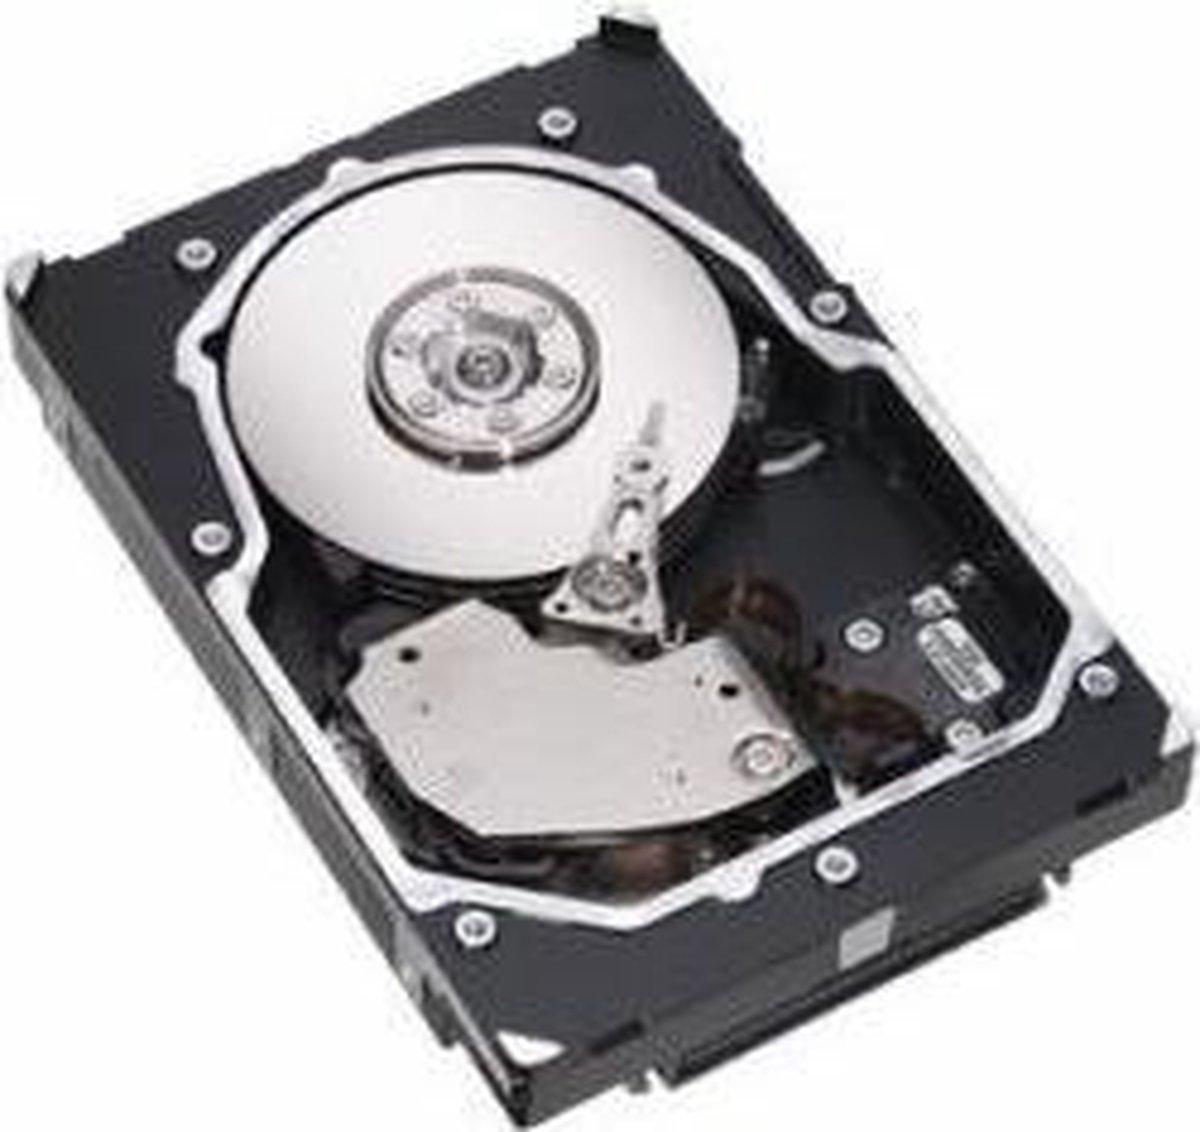 Lenovo 4XB0F28665 - interne harde schijf - 600GB kopen